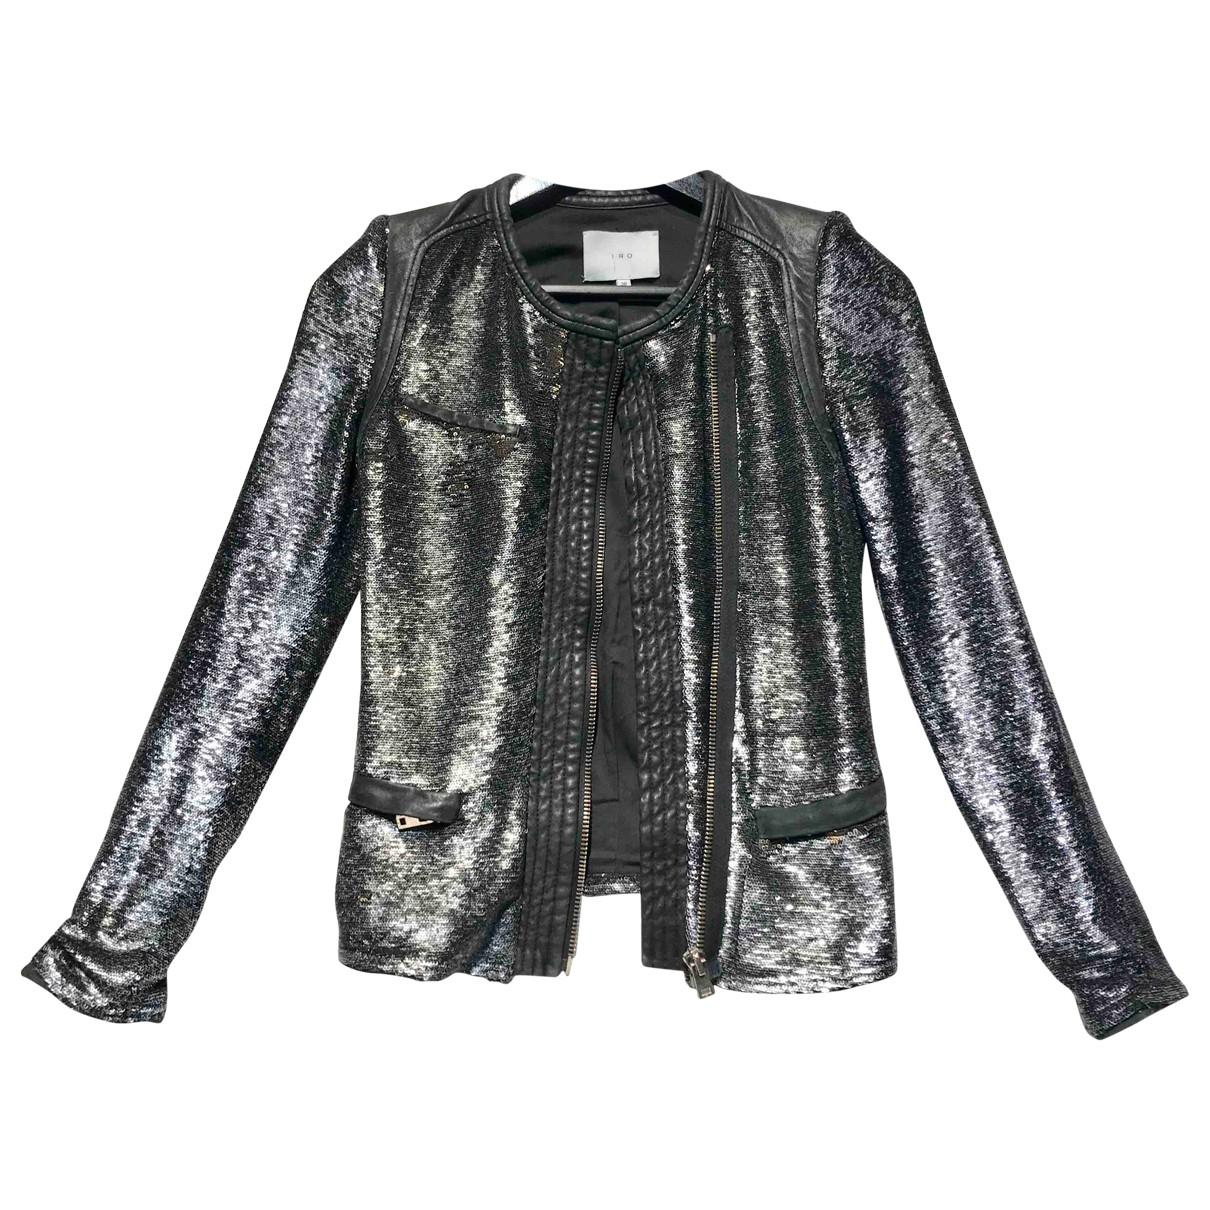 Iro Fall Winter 2019 Metallic Glitter jacket  for Men 36 UK - US